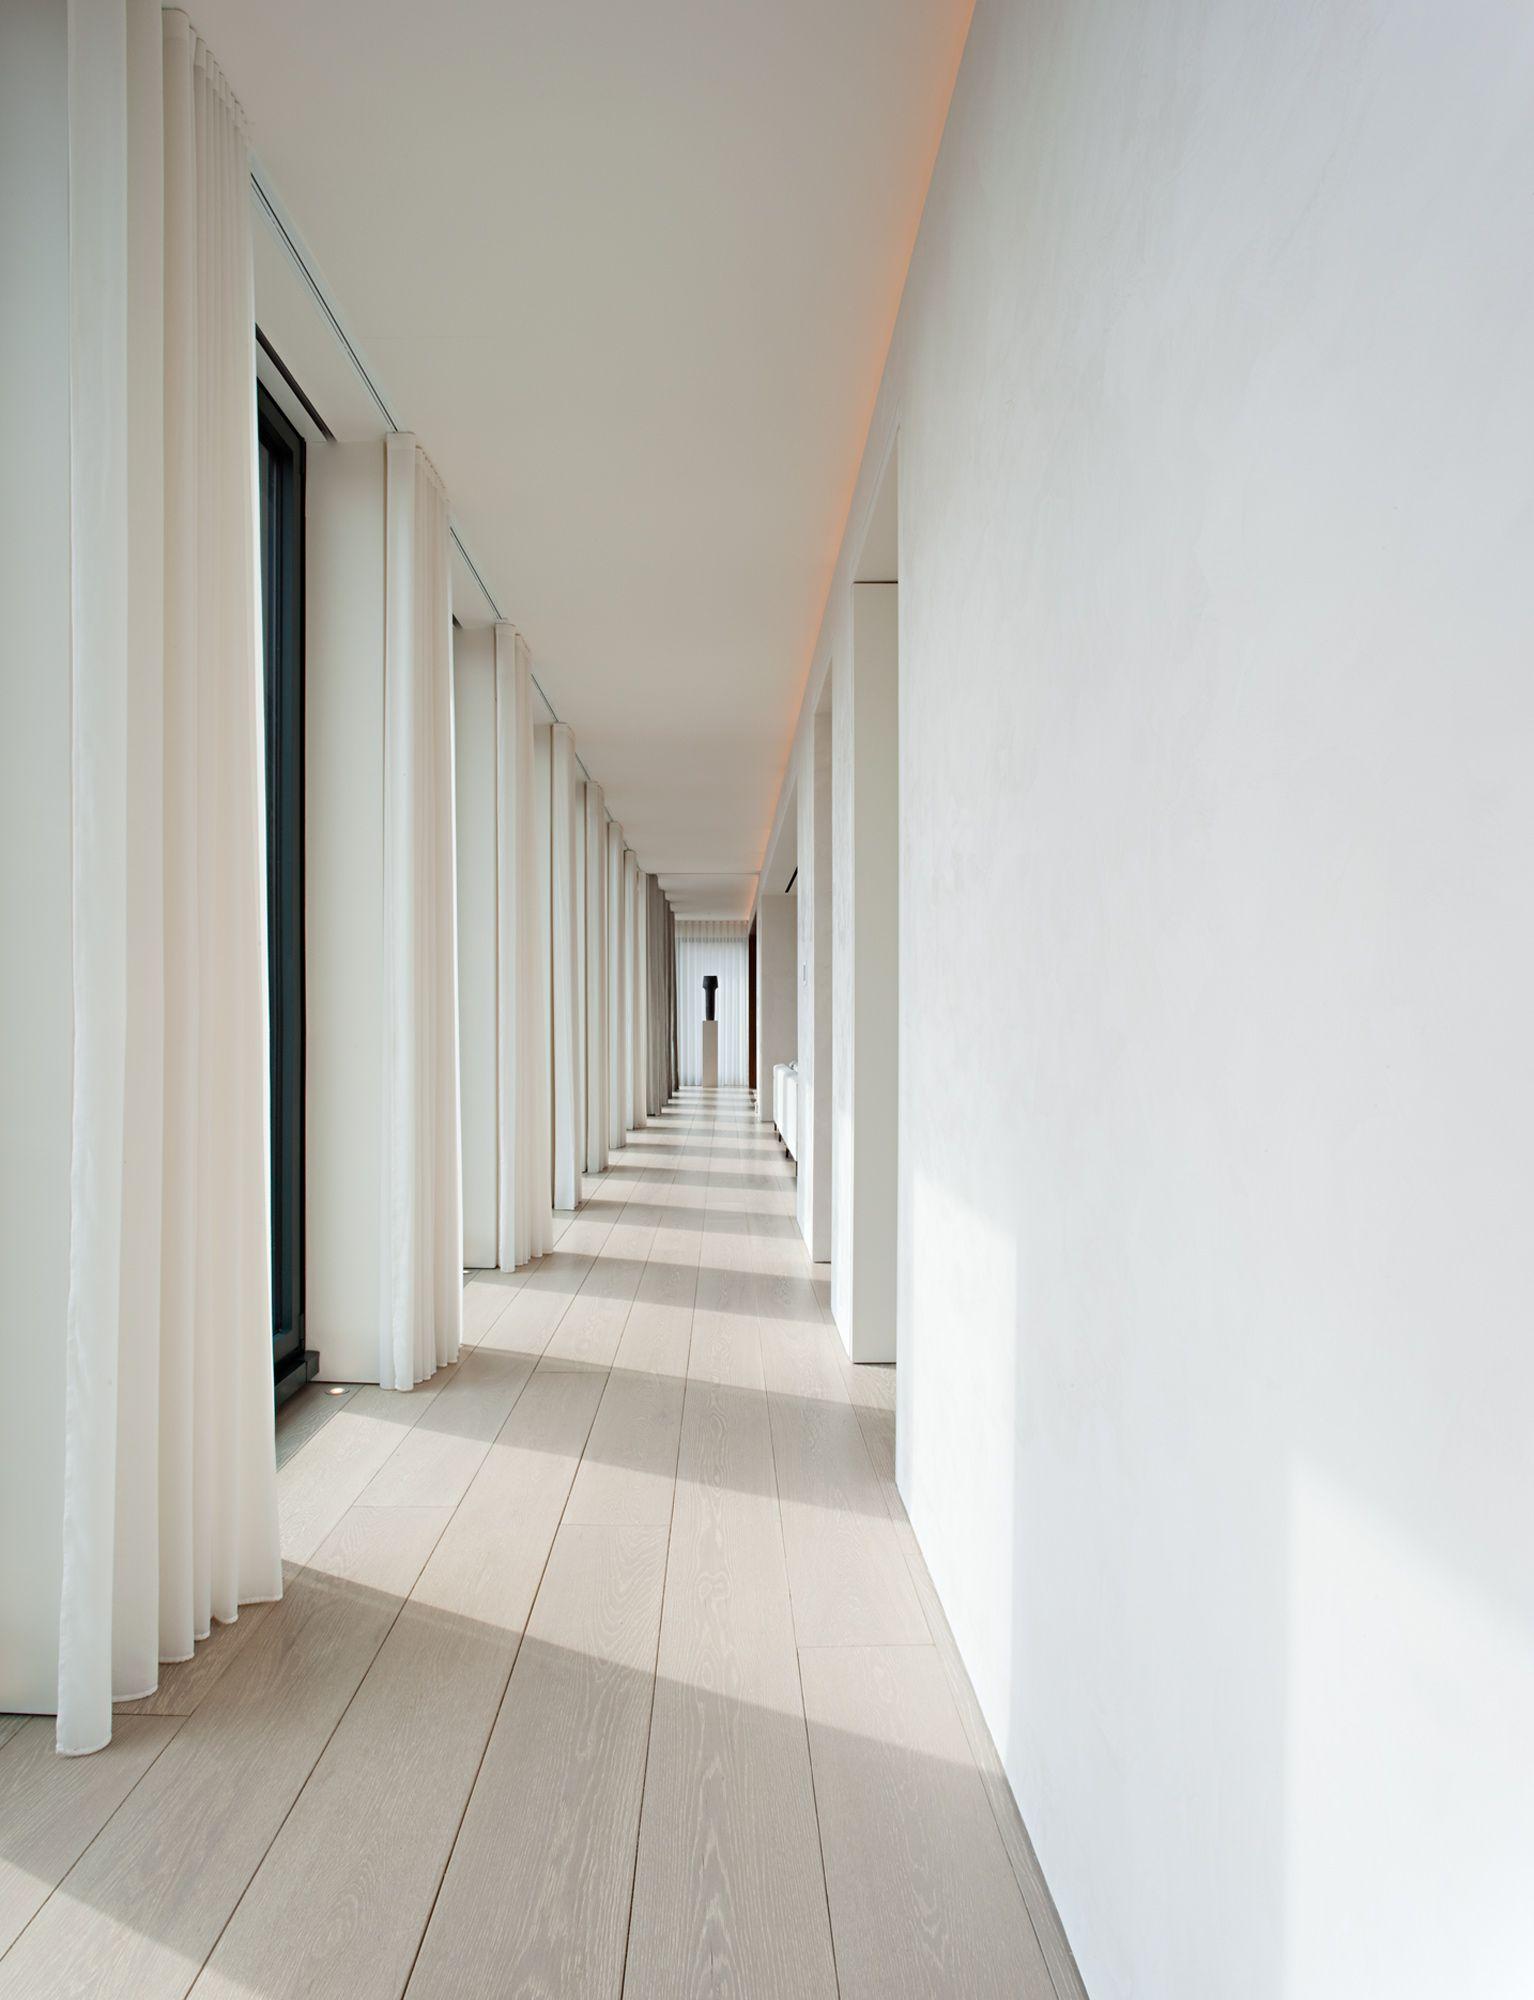 Lighting Basement Washroom Stairs: Beautiful, White Simplicity From Johnpawson.com/works